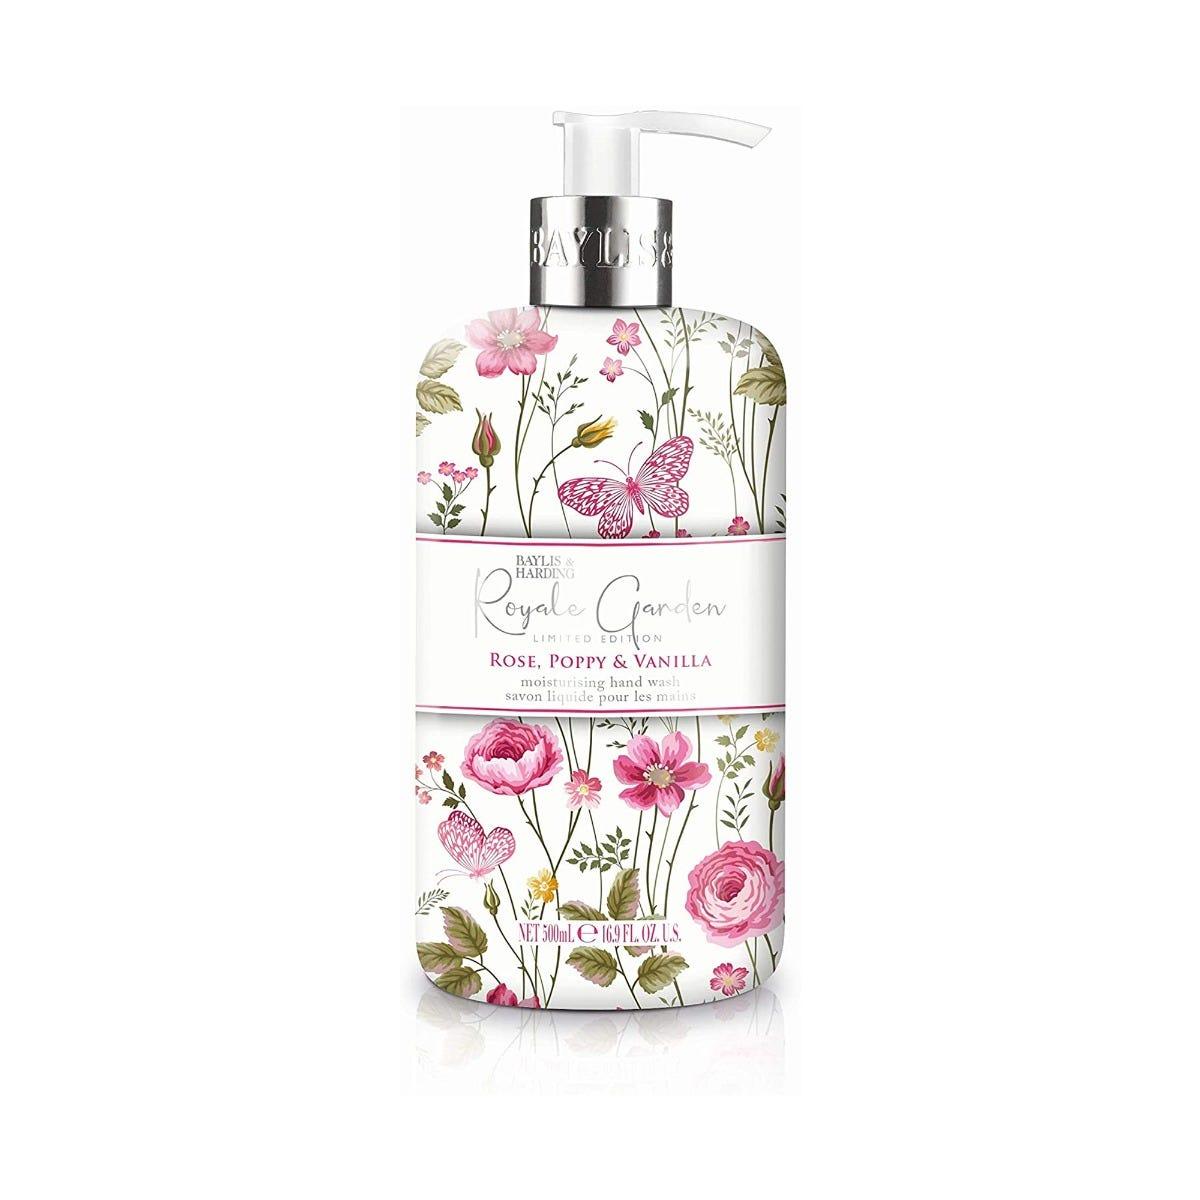 Jabón para manos Baylis & Harding® Royale Garden aroma vainilla